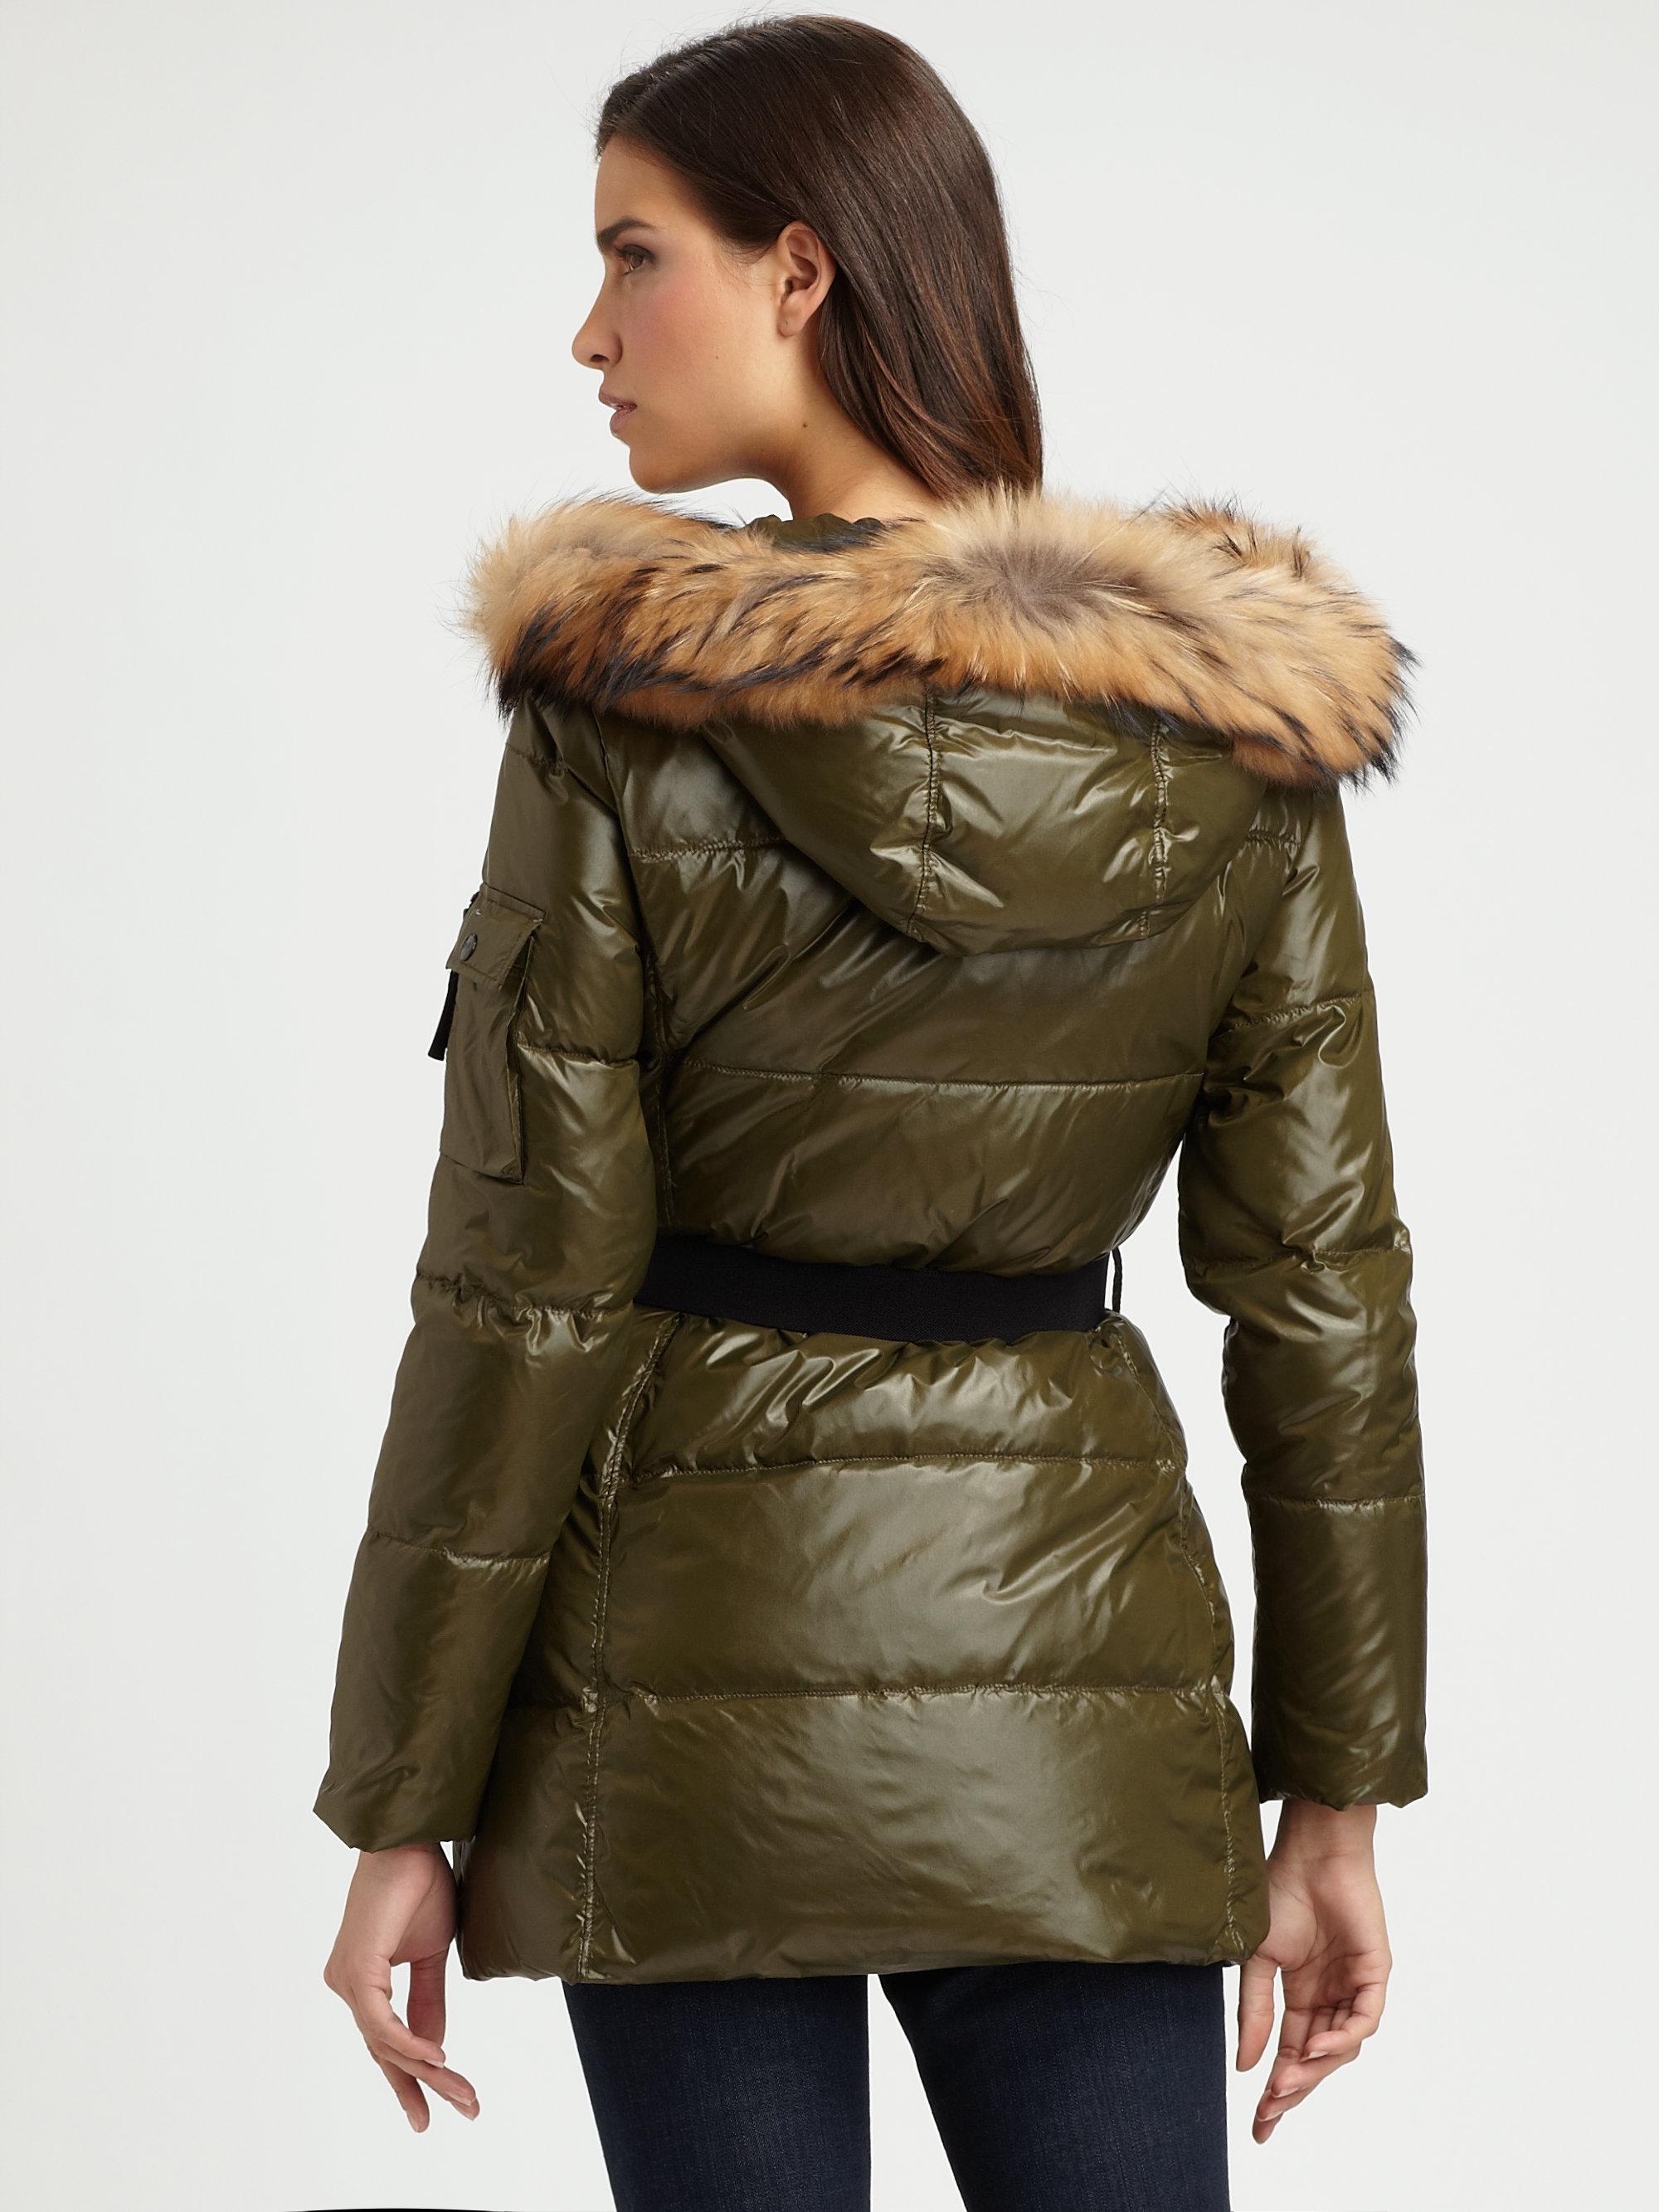 Sam Snowcat Racoontrimmed Puffer Coat In Natural Lyst